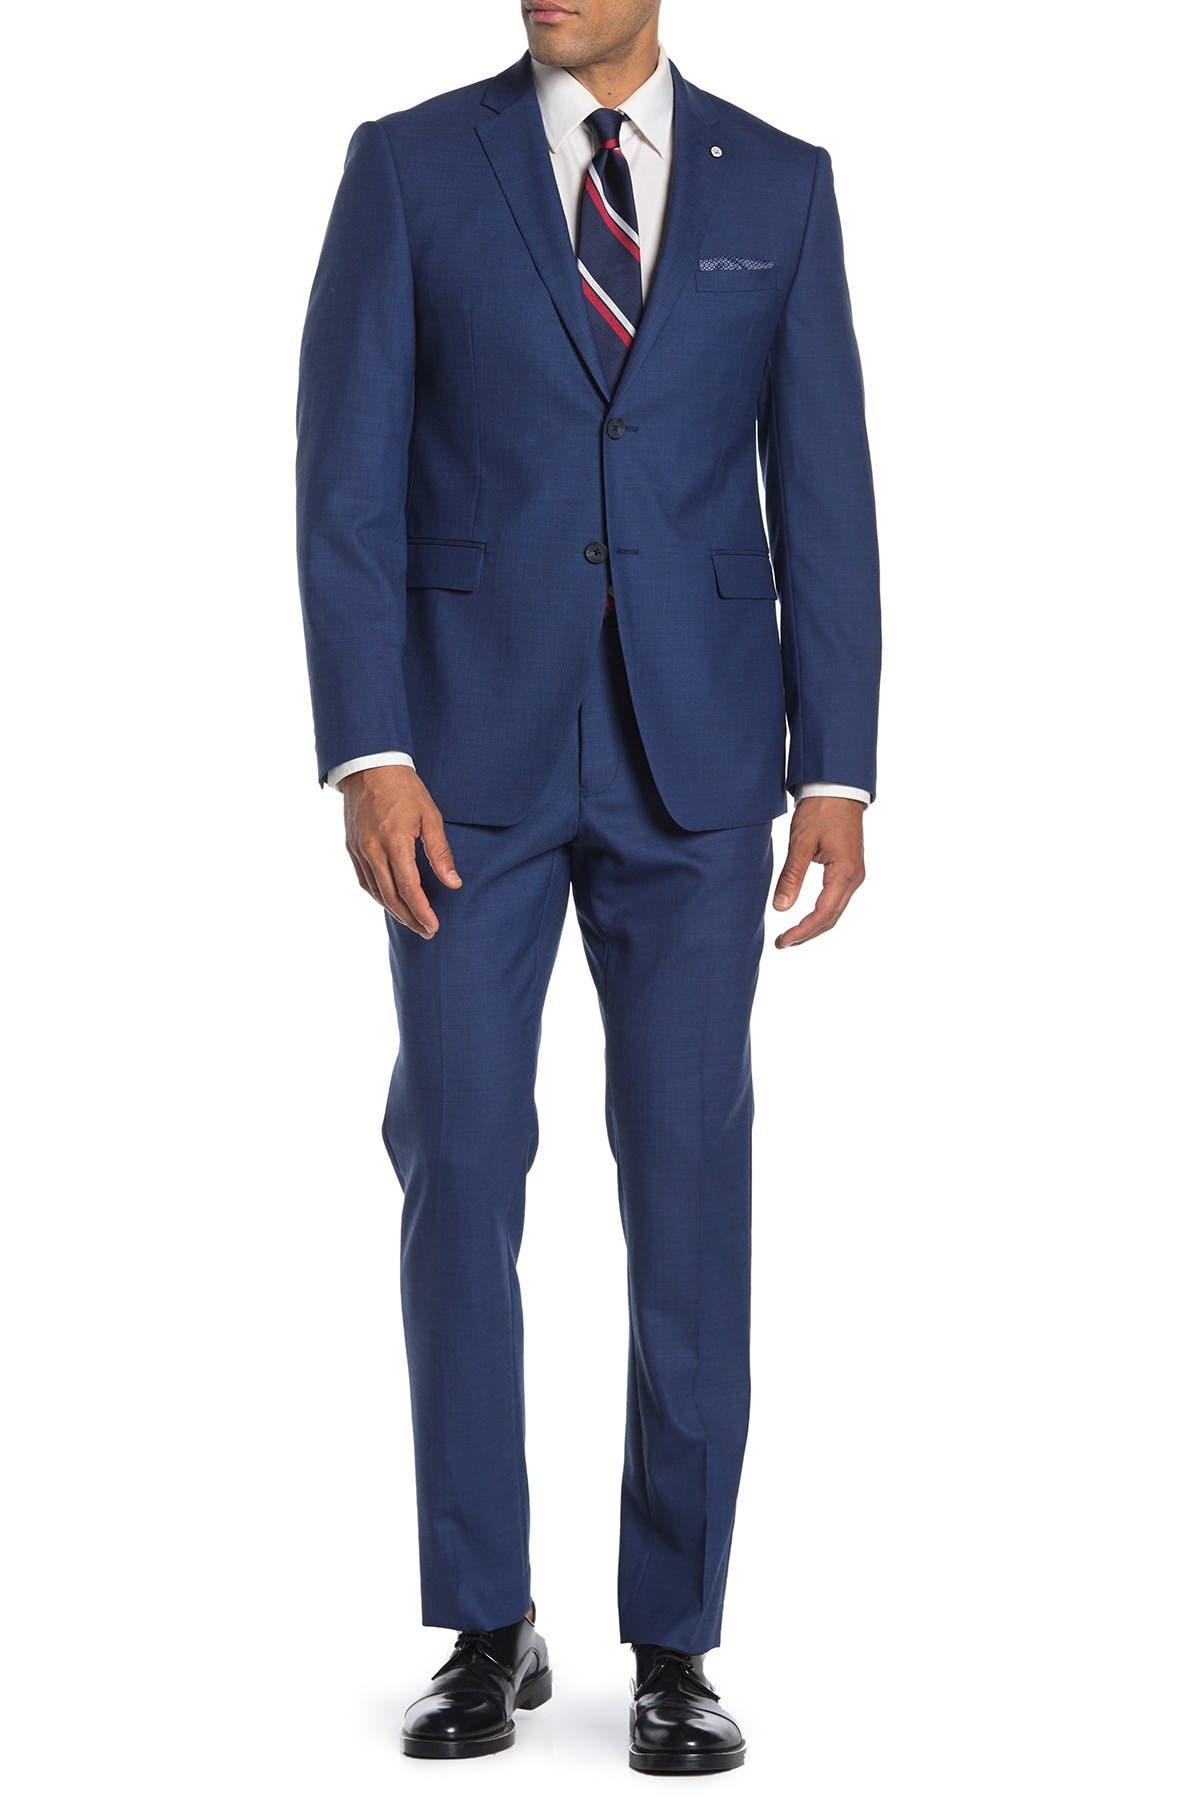 Image of Original Penguin Nested Blue Sharkskin Slim Fit 2-Piece Suit